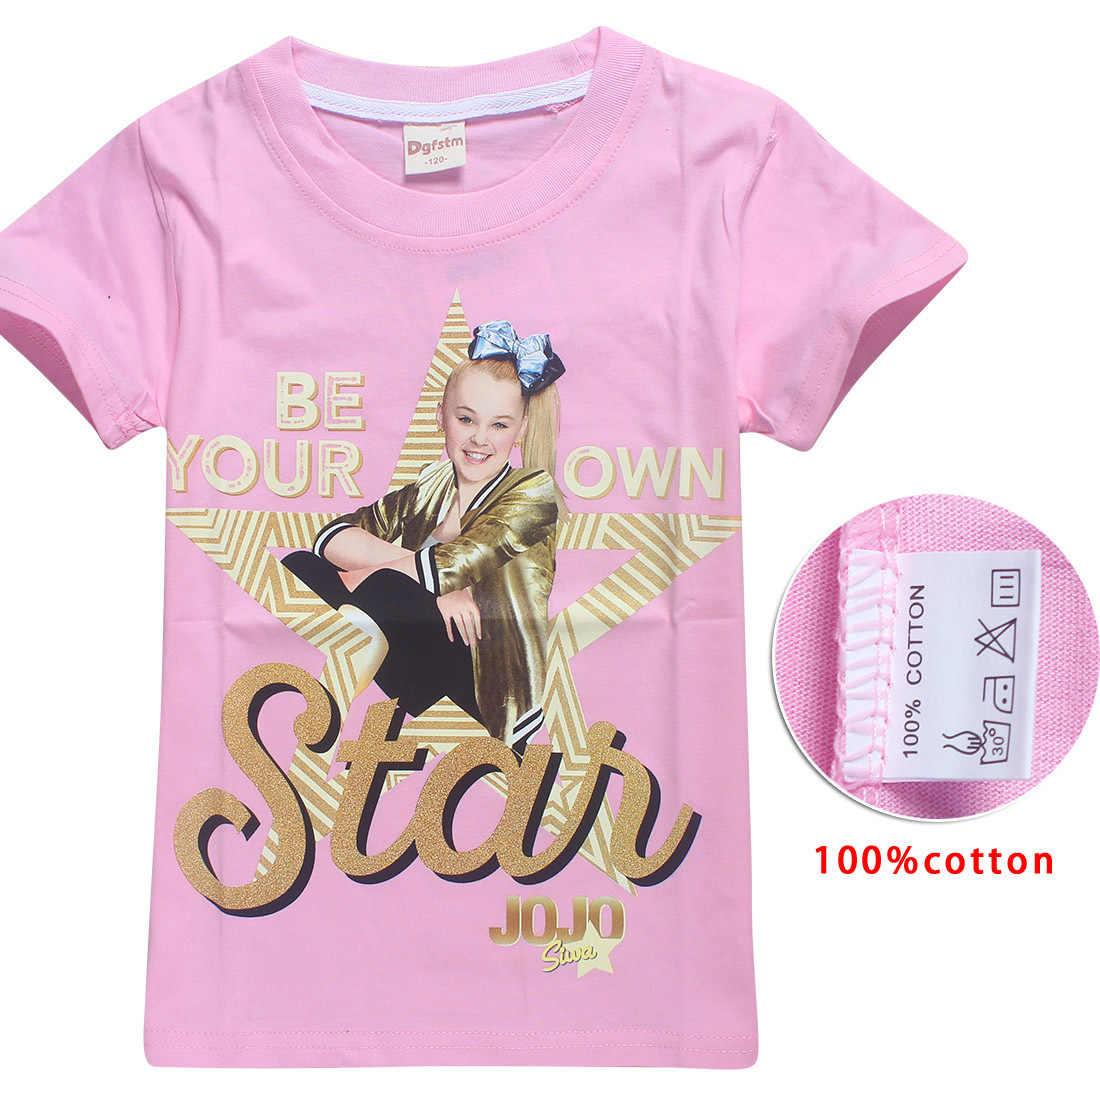 ab3b0697f2f5f 2018 New Summer Jojo Siwa Shirts Baby Girls Tshirts Short Sleeve T Shirts  for Kids Moana T-shirt Child Sport Clothes 4-12Y